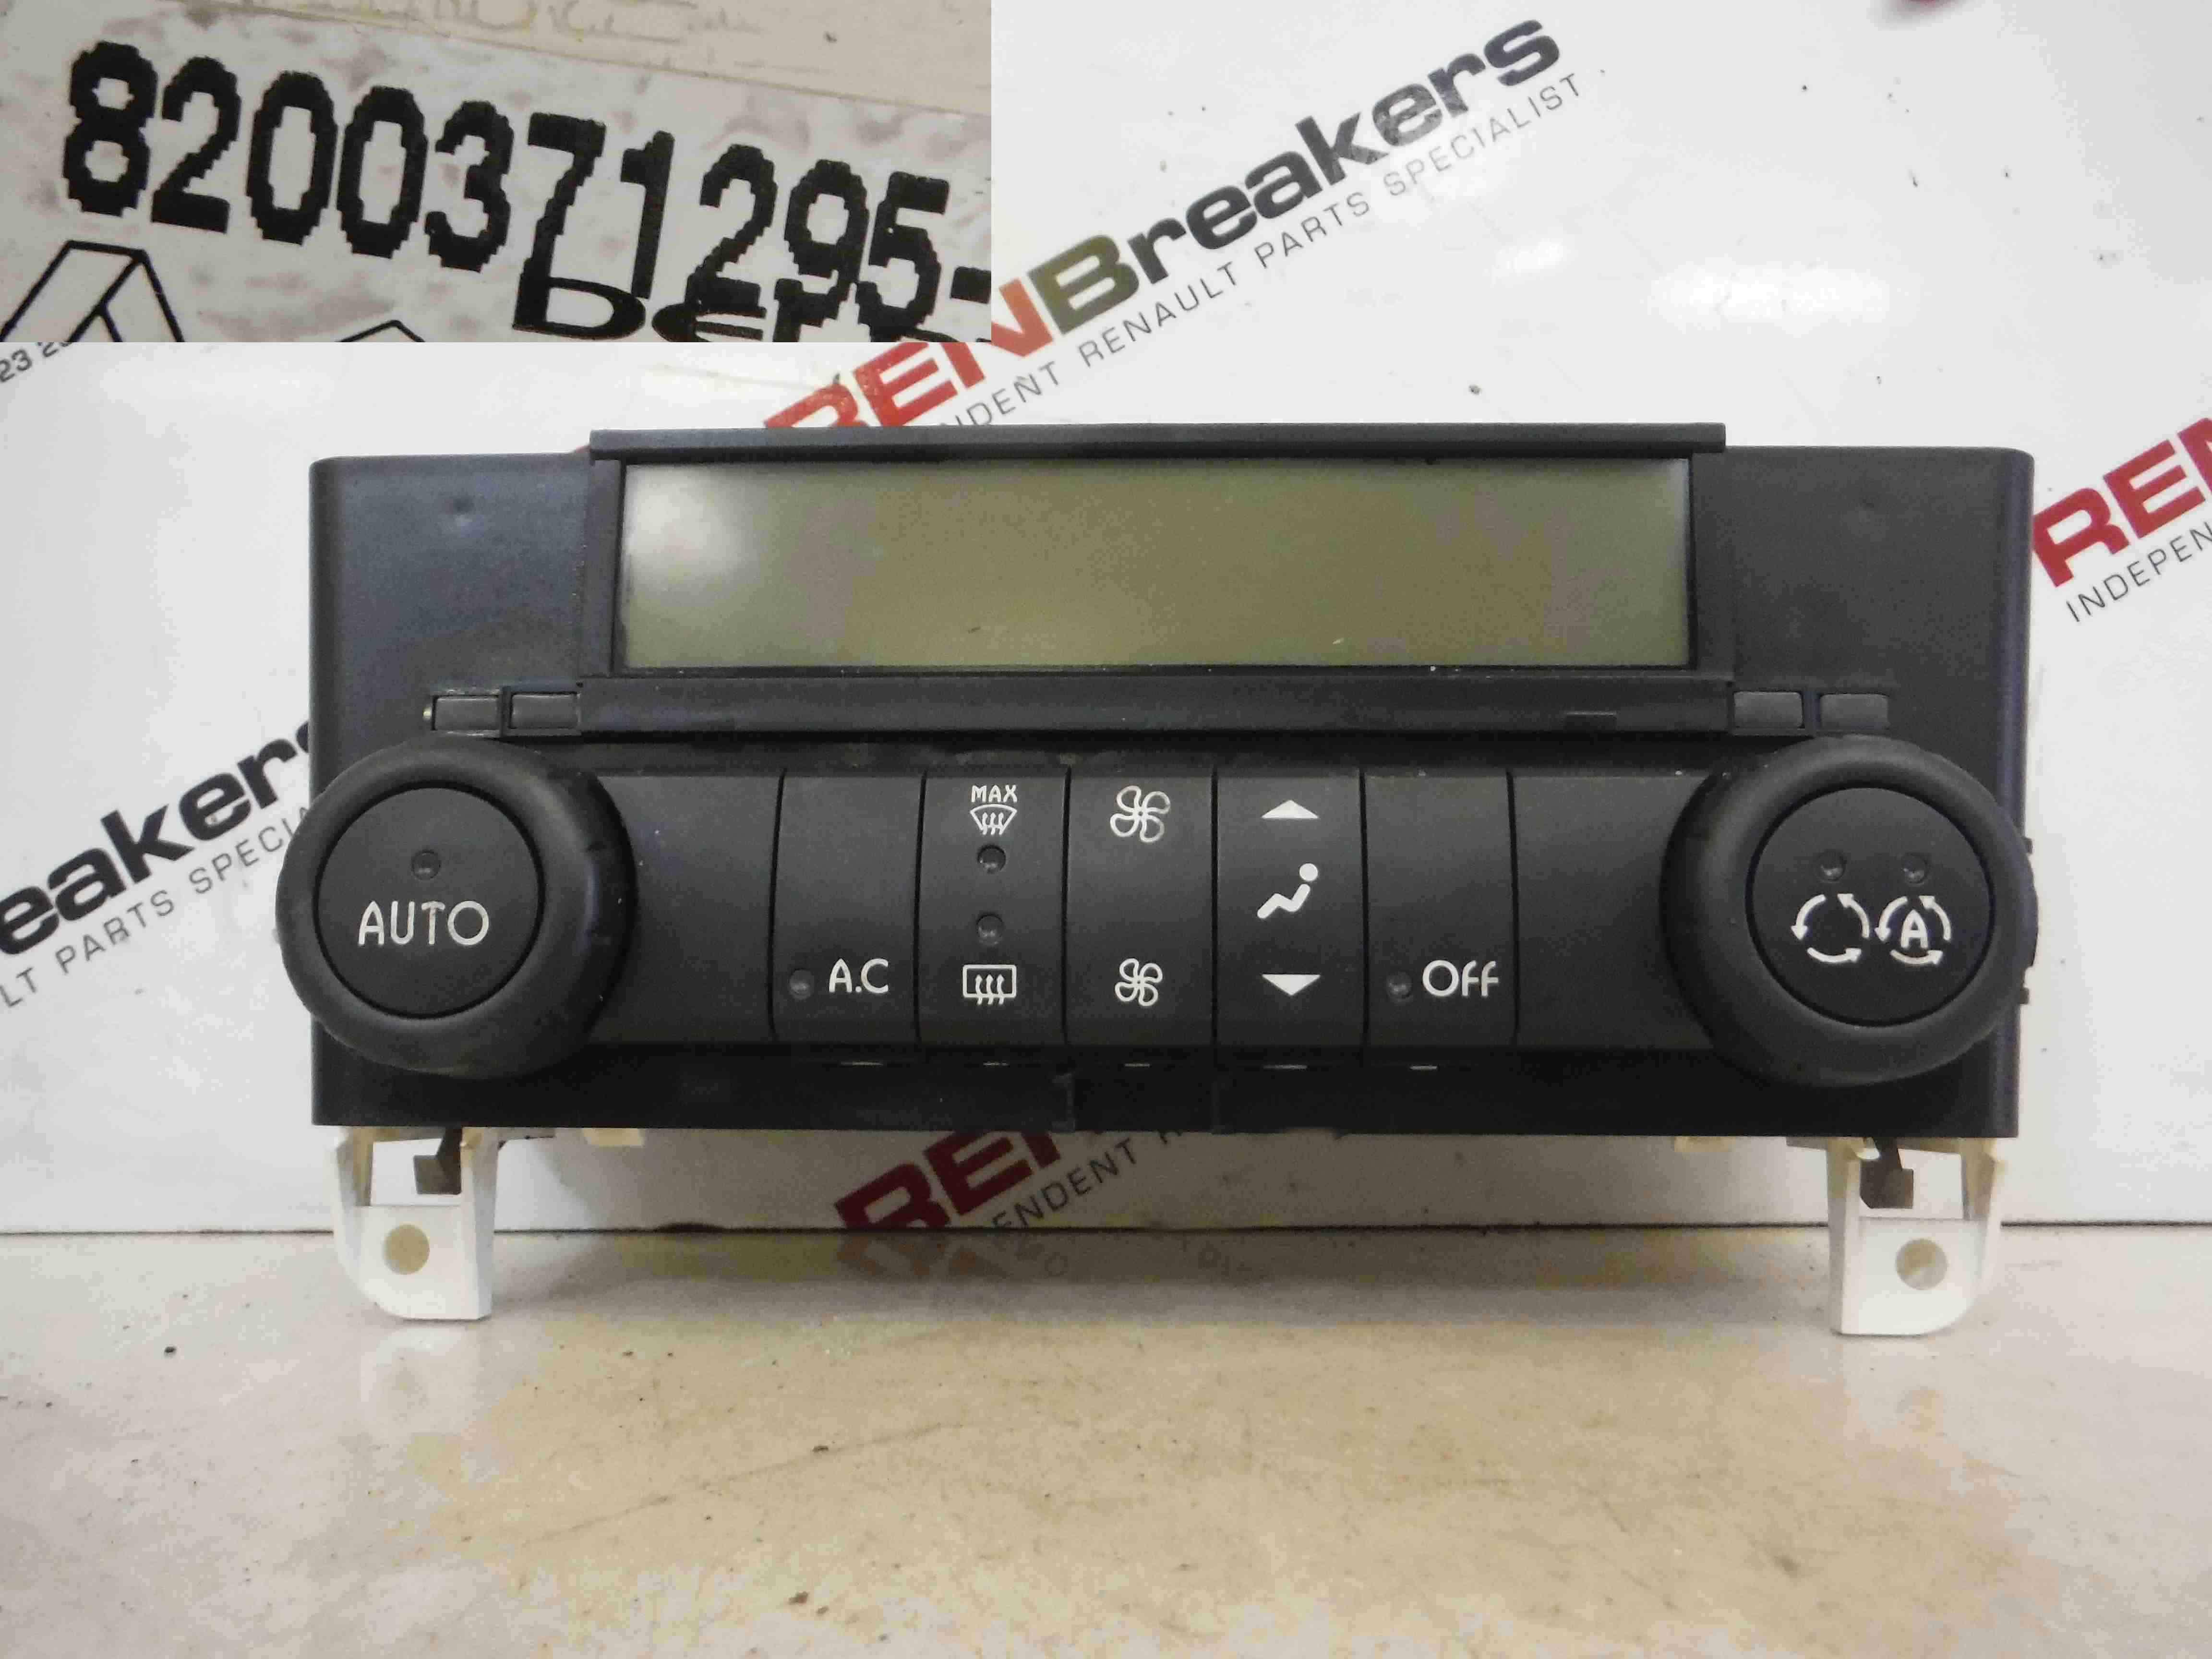 Renault Laguna 2005-2007 Heater Controls Dials Gauges Digital 8200371295